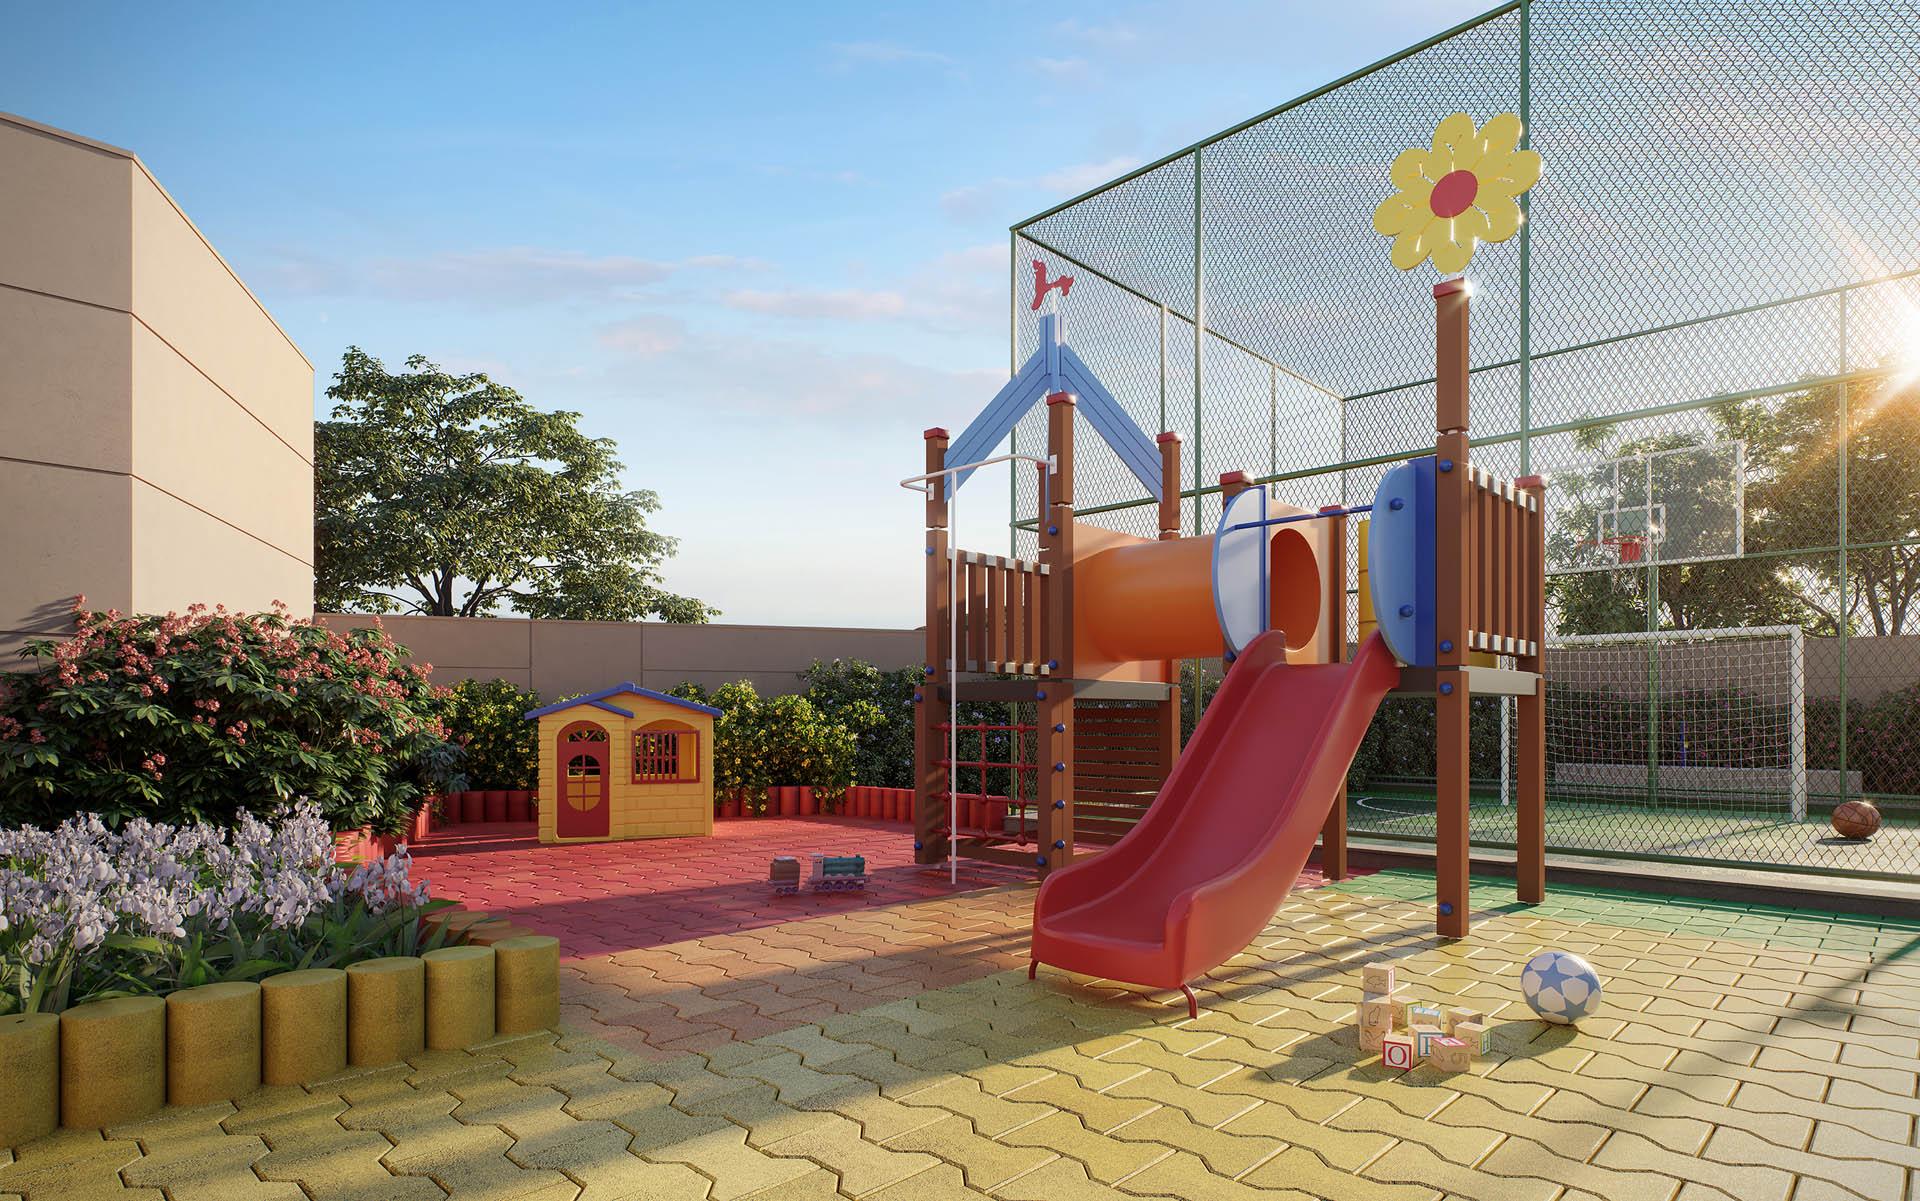 Perspectiva do Playground